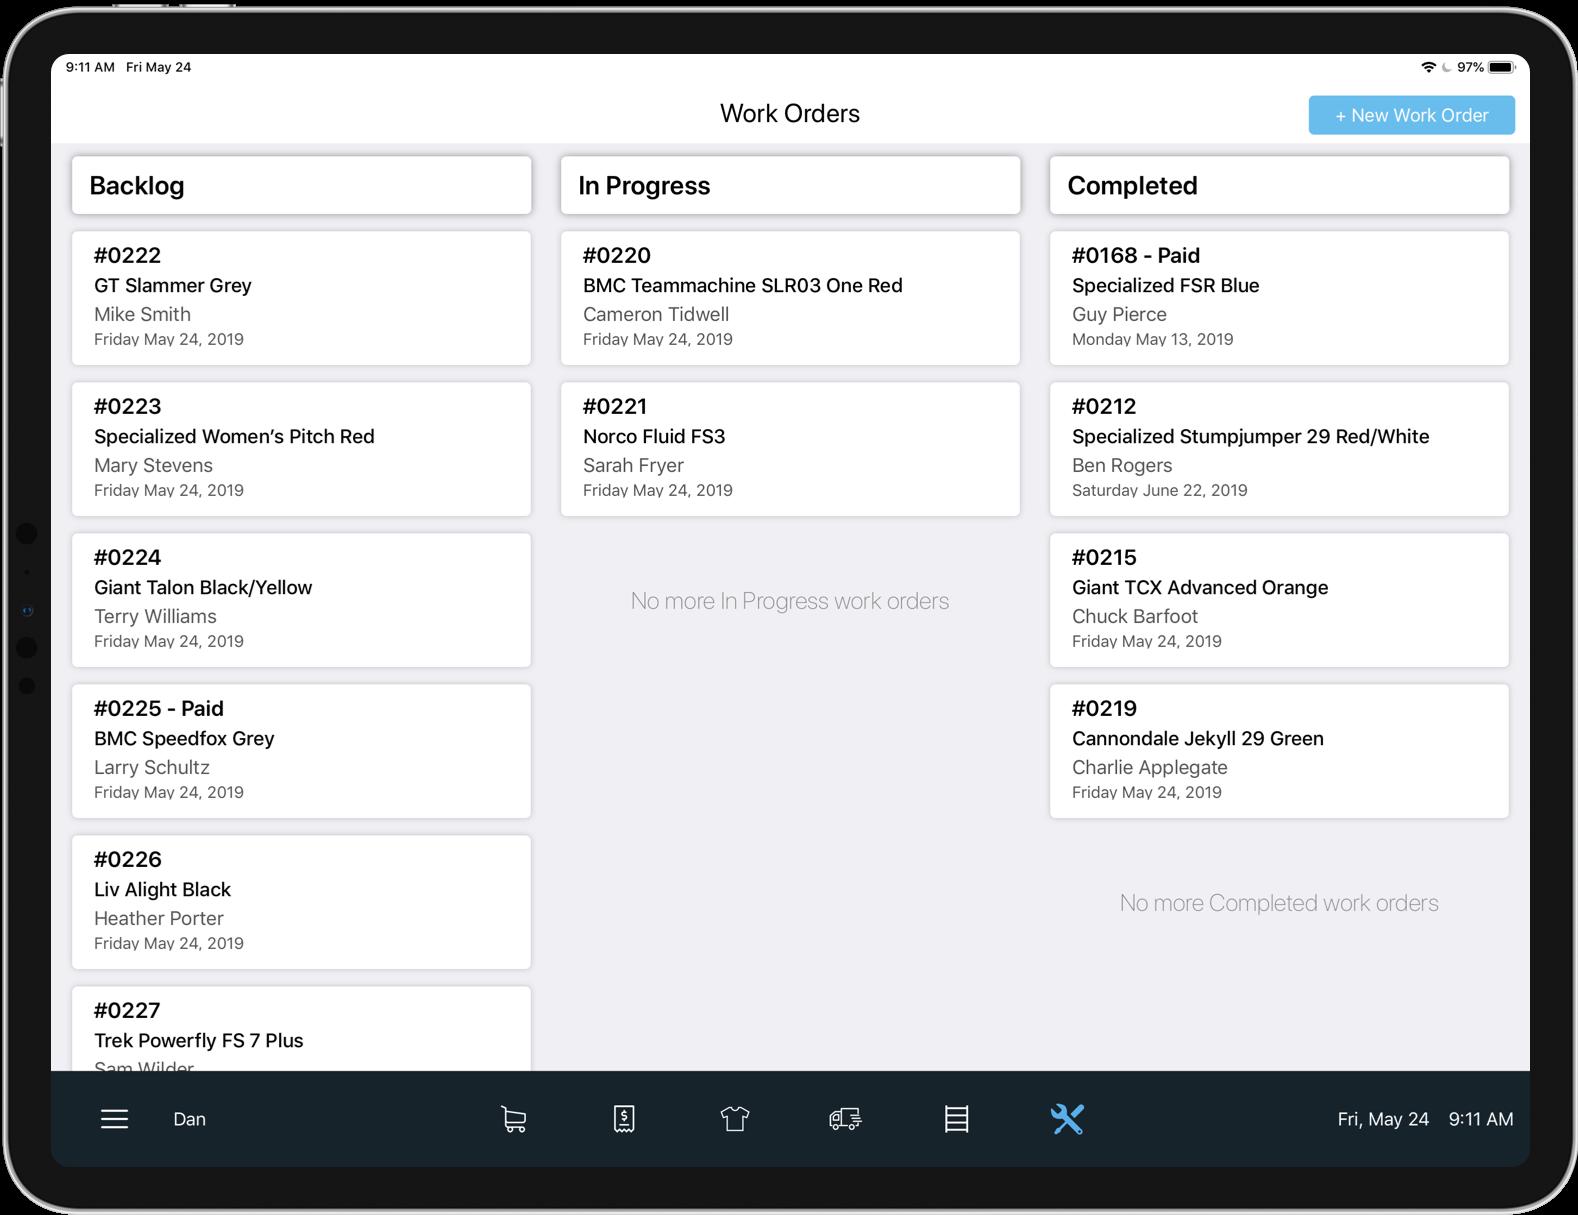 XWORKS_iPad.png